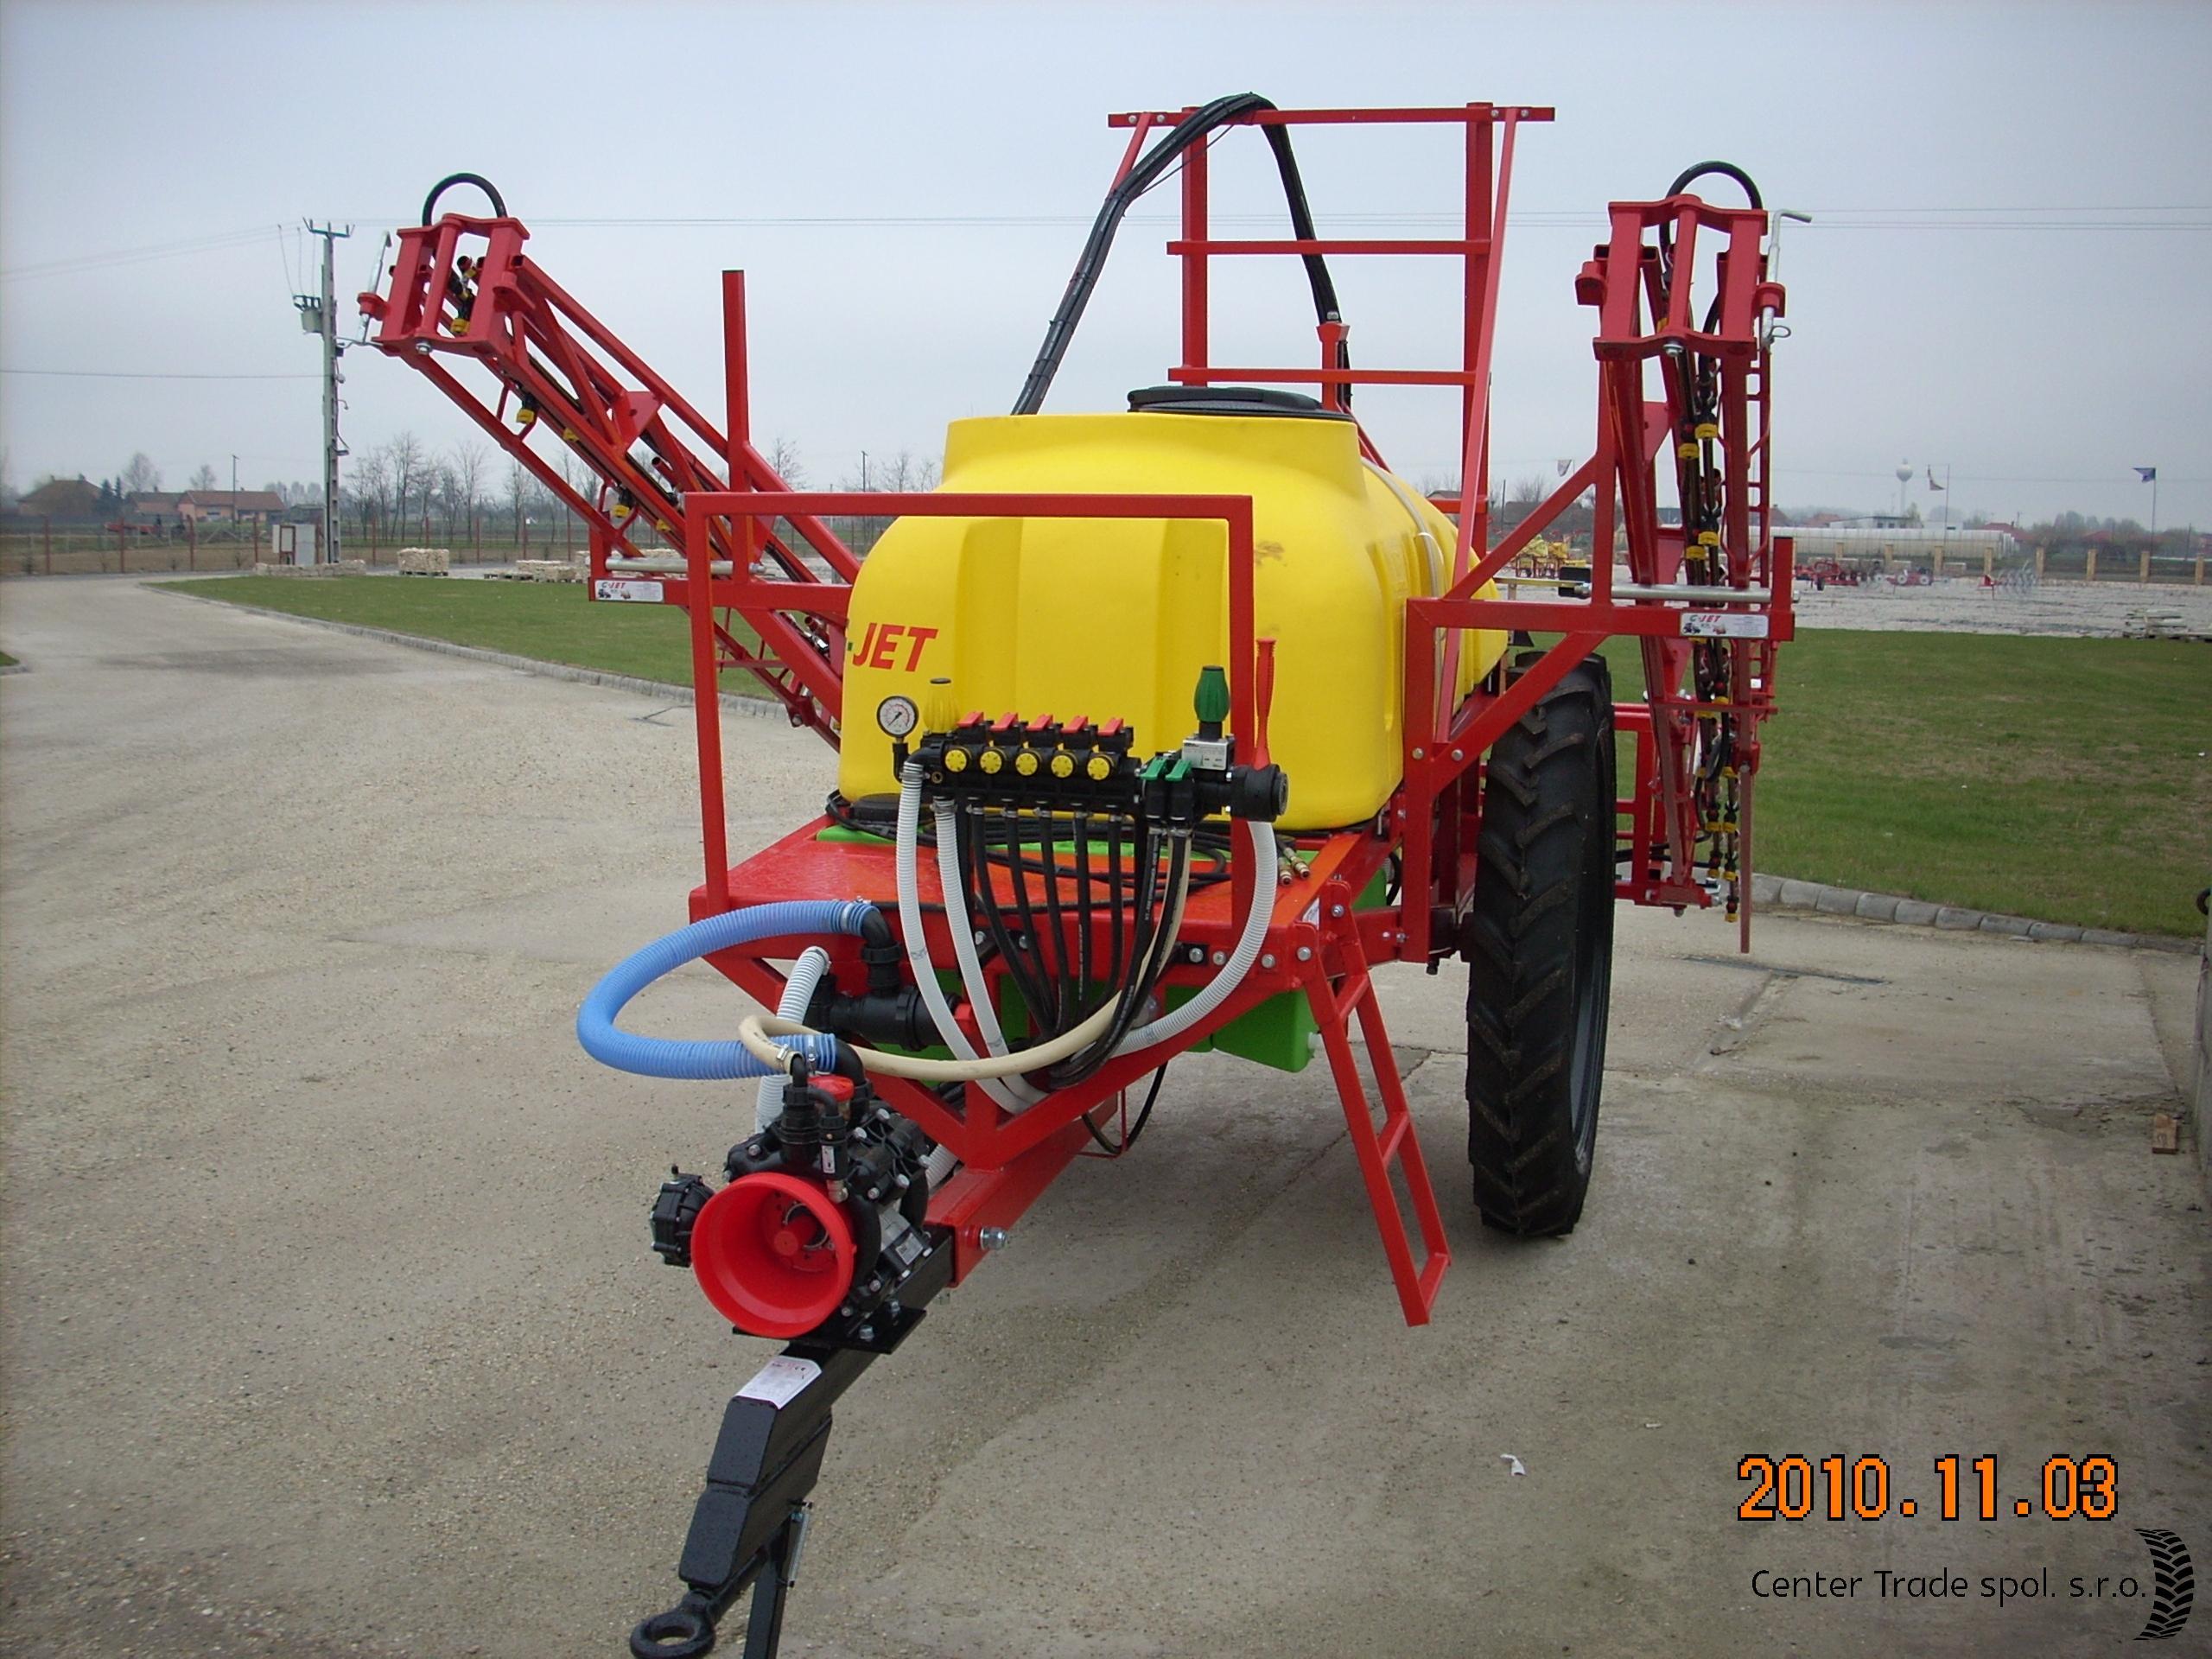 G-JET 2200 / 24 mrxhidro postrekovač